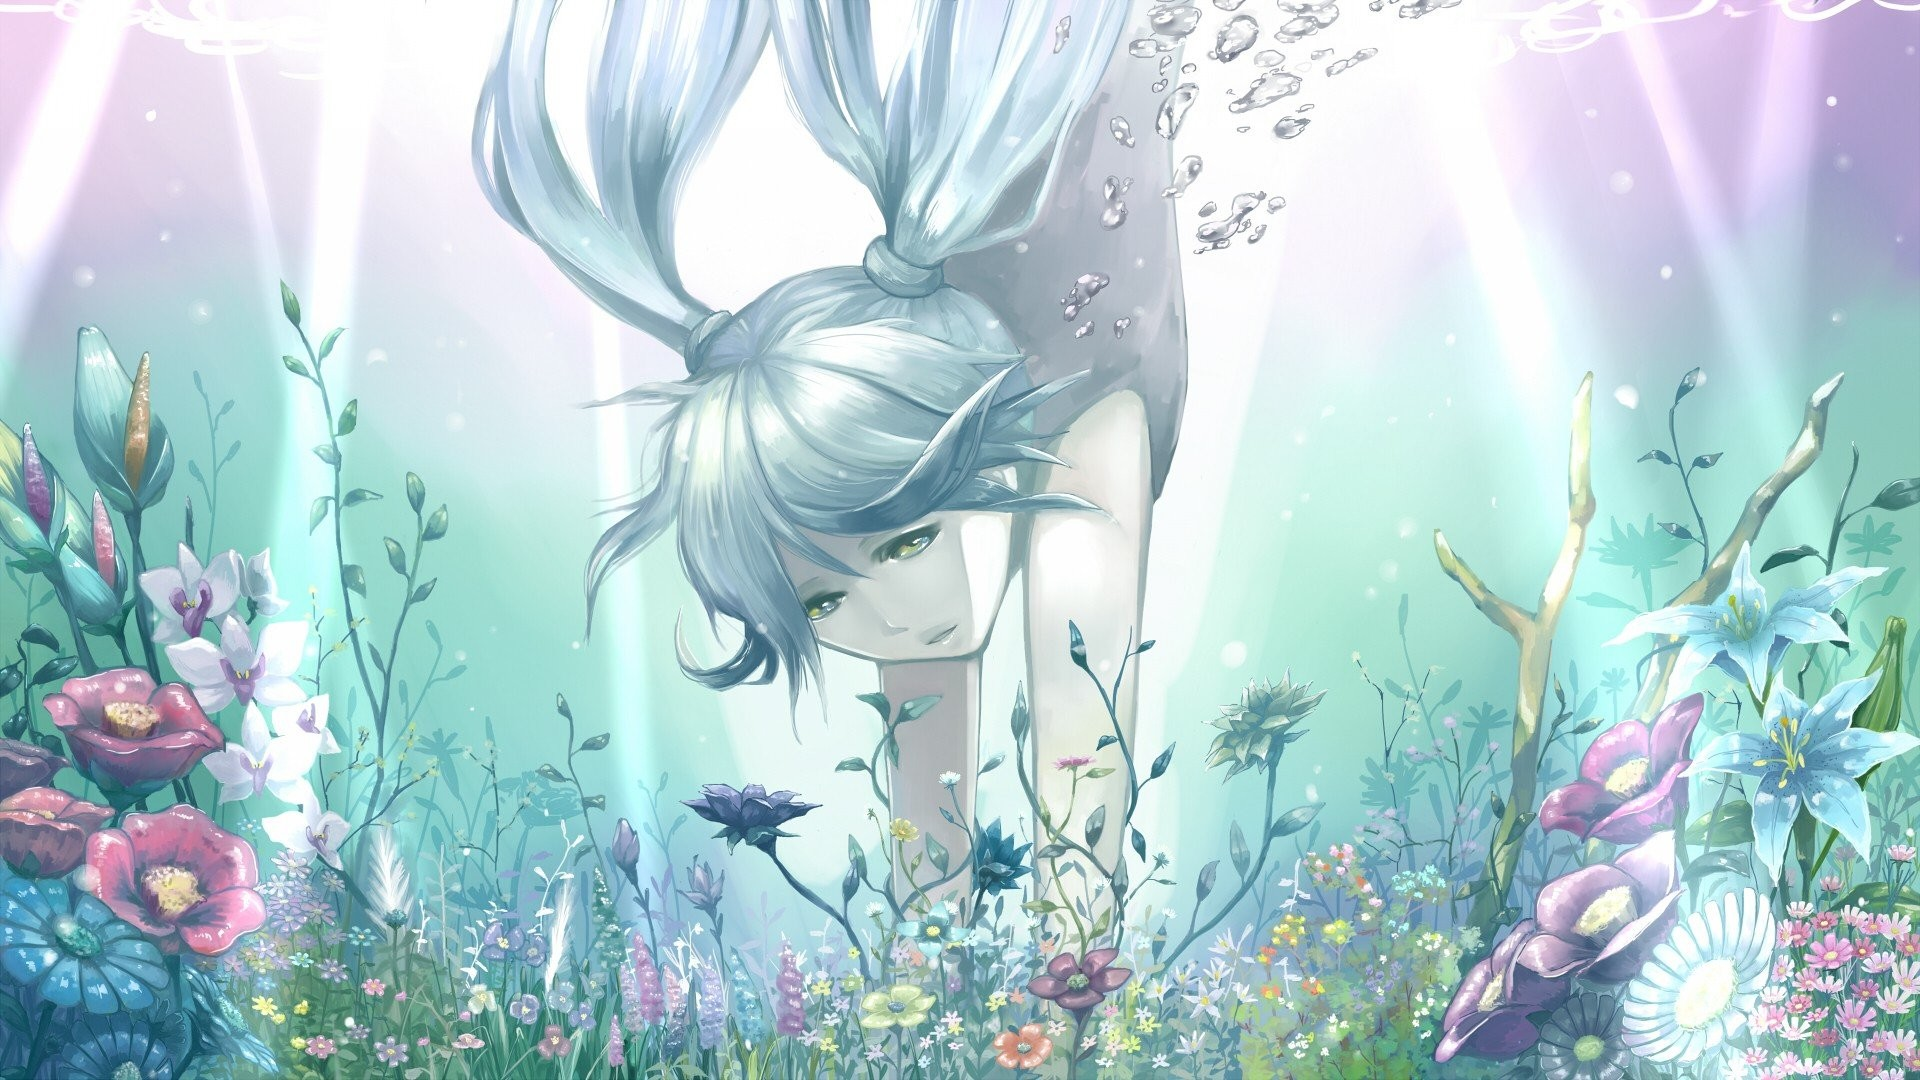 Anime Girls Aqua Hair Bangs Bare Shoulders Blue Bubbles Dress Flowers Gray  Green Eyes Ornaments Hatsune Miku Long Nature Plants Twintails Underwater  …